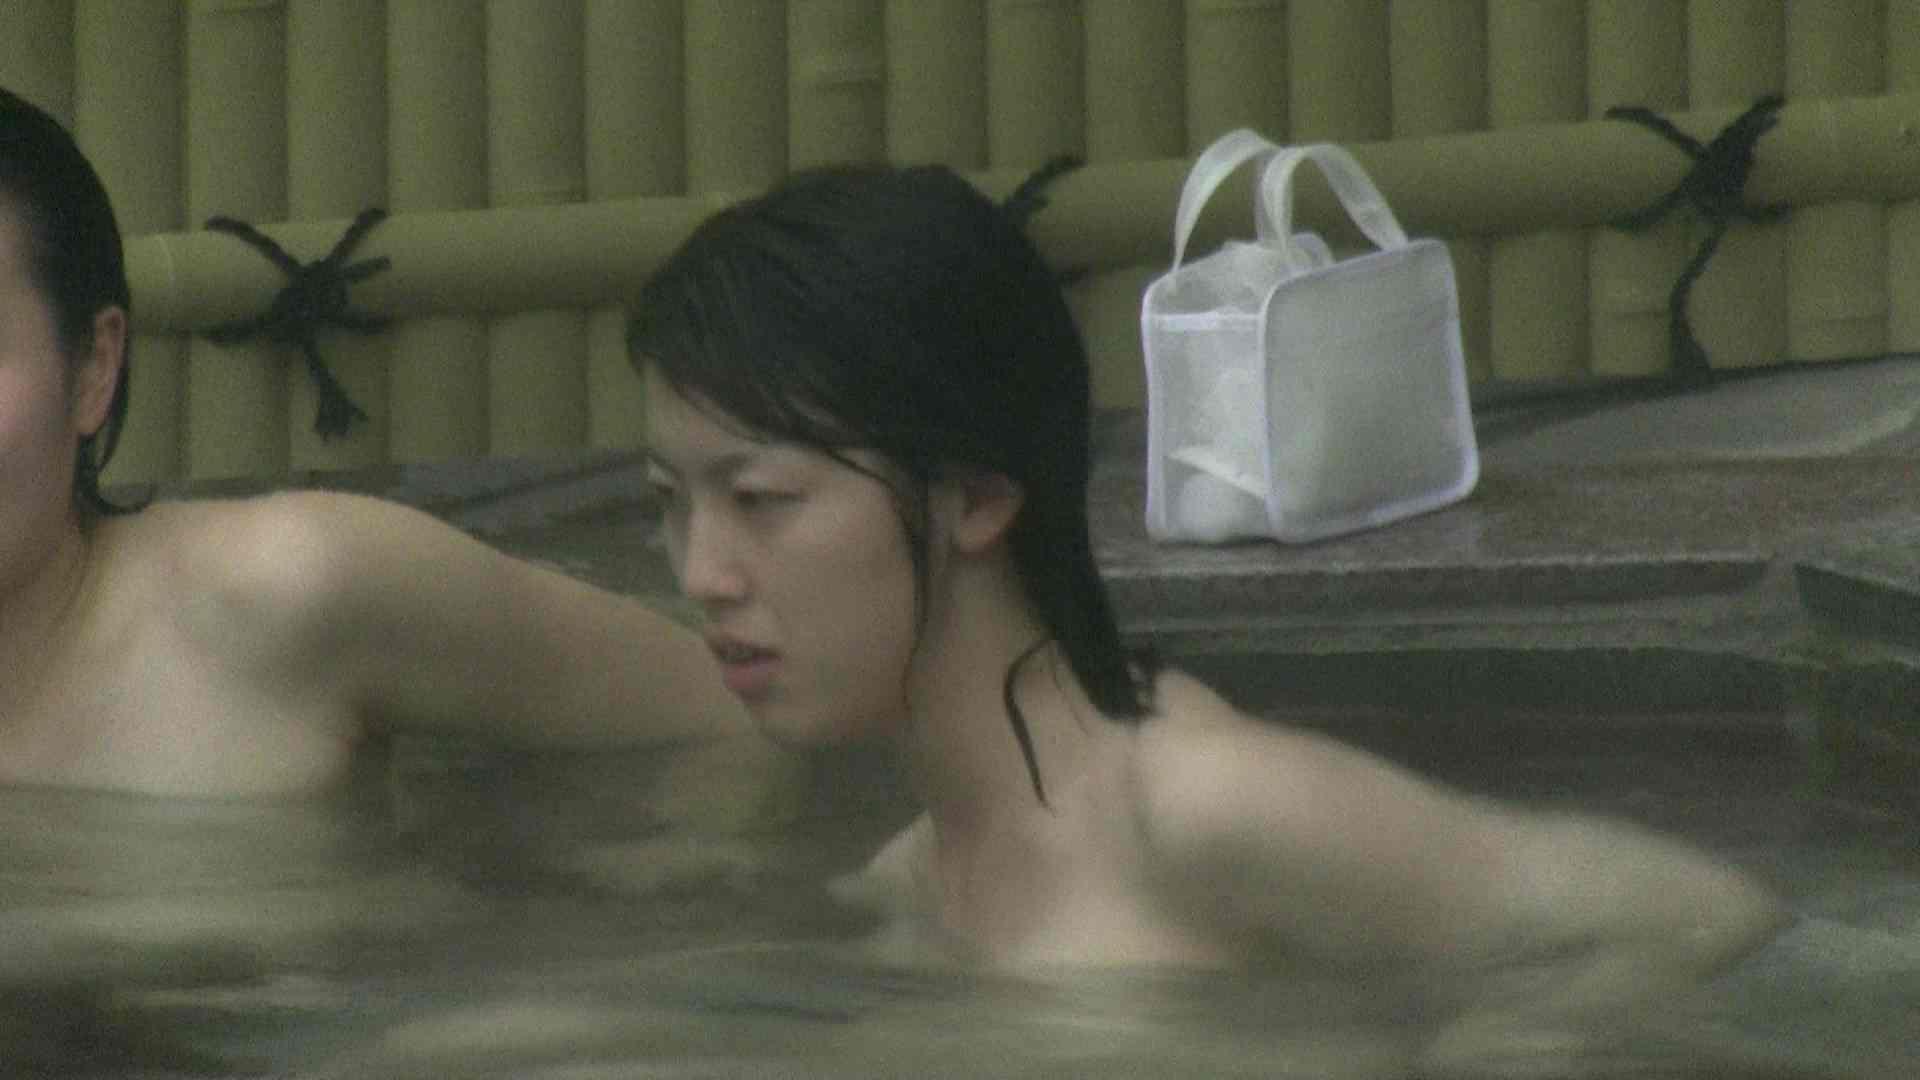 Aquaな露天風呂Vol.171 0  19連発 6